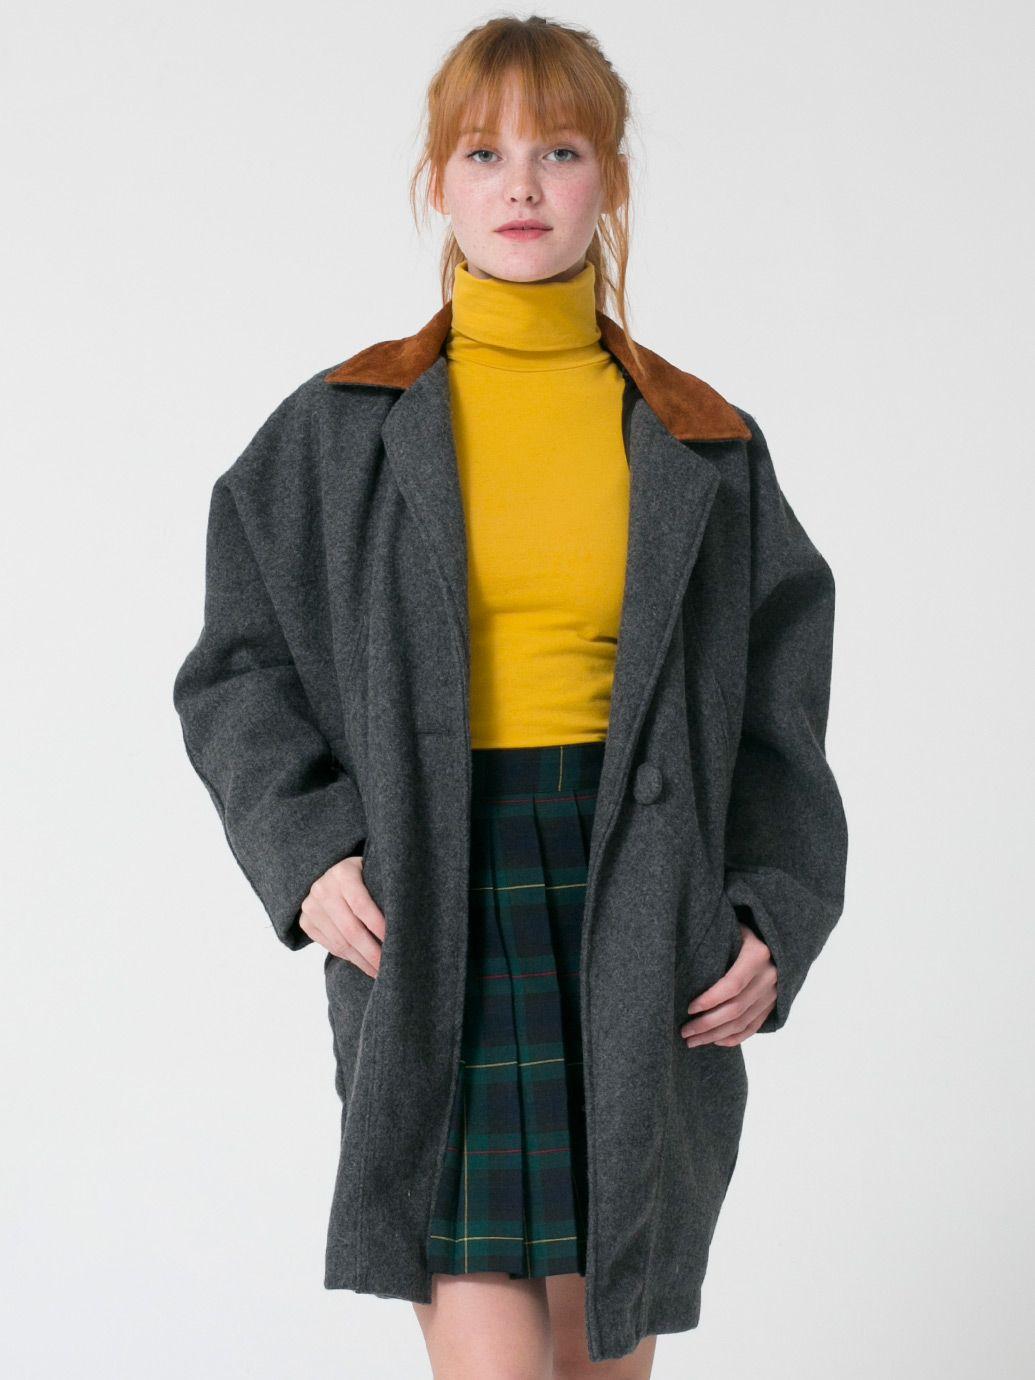 Petite Unisex Long Wool Coat Parkas & Coats Women's